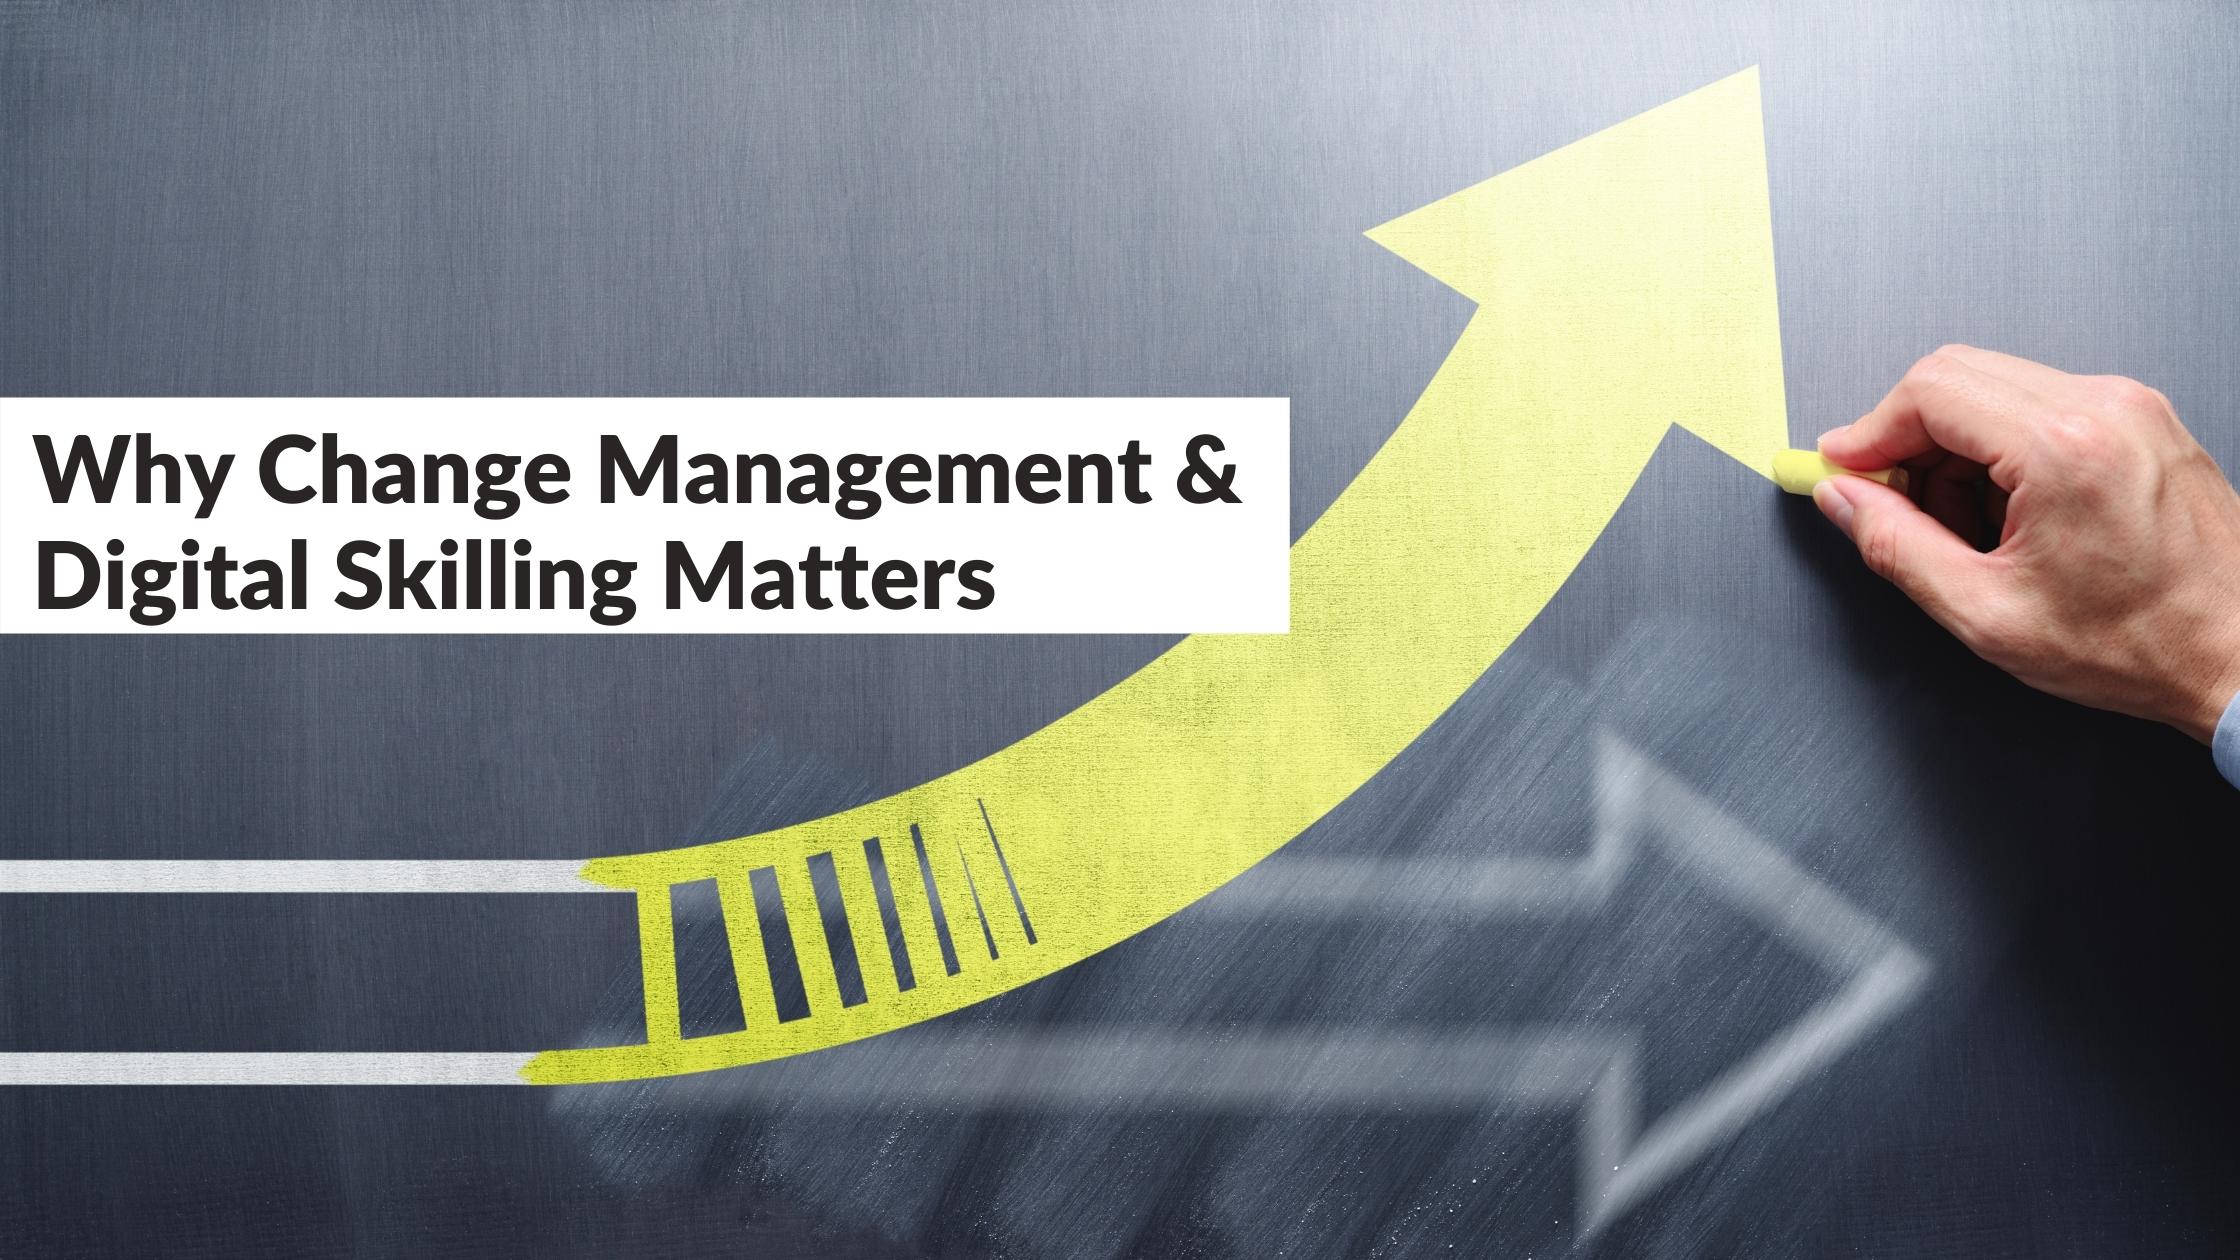 Why Change Management & Digital Skilling Matters